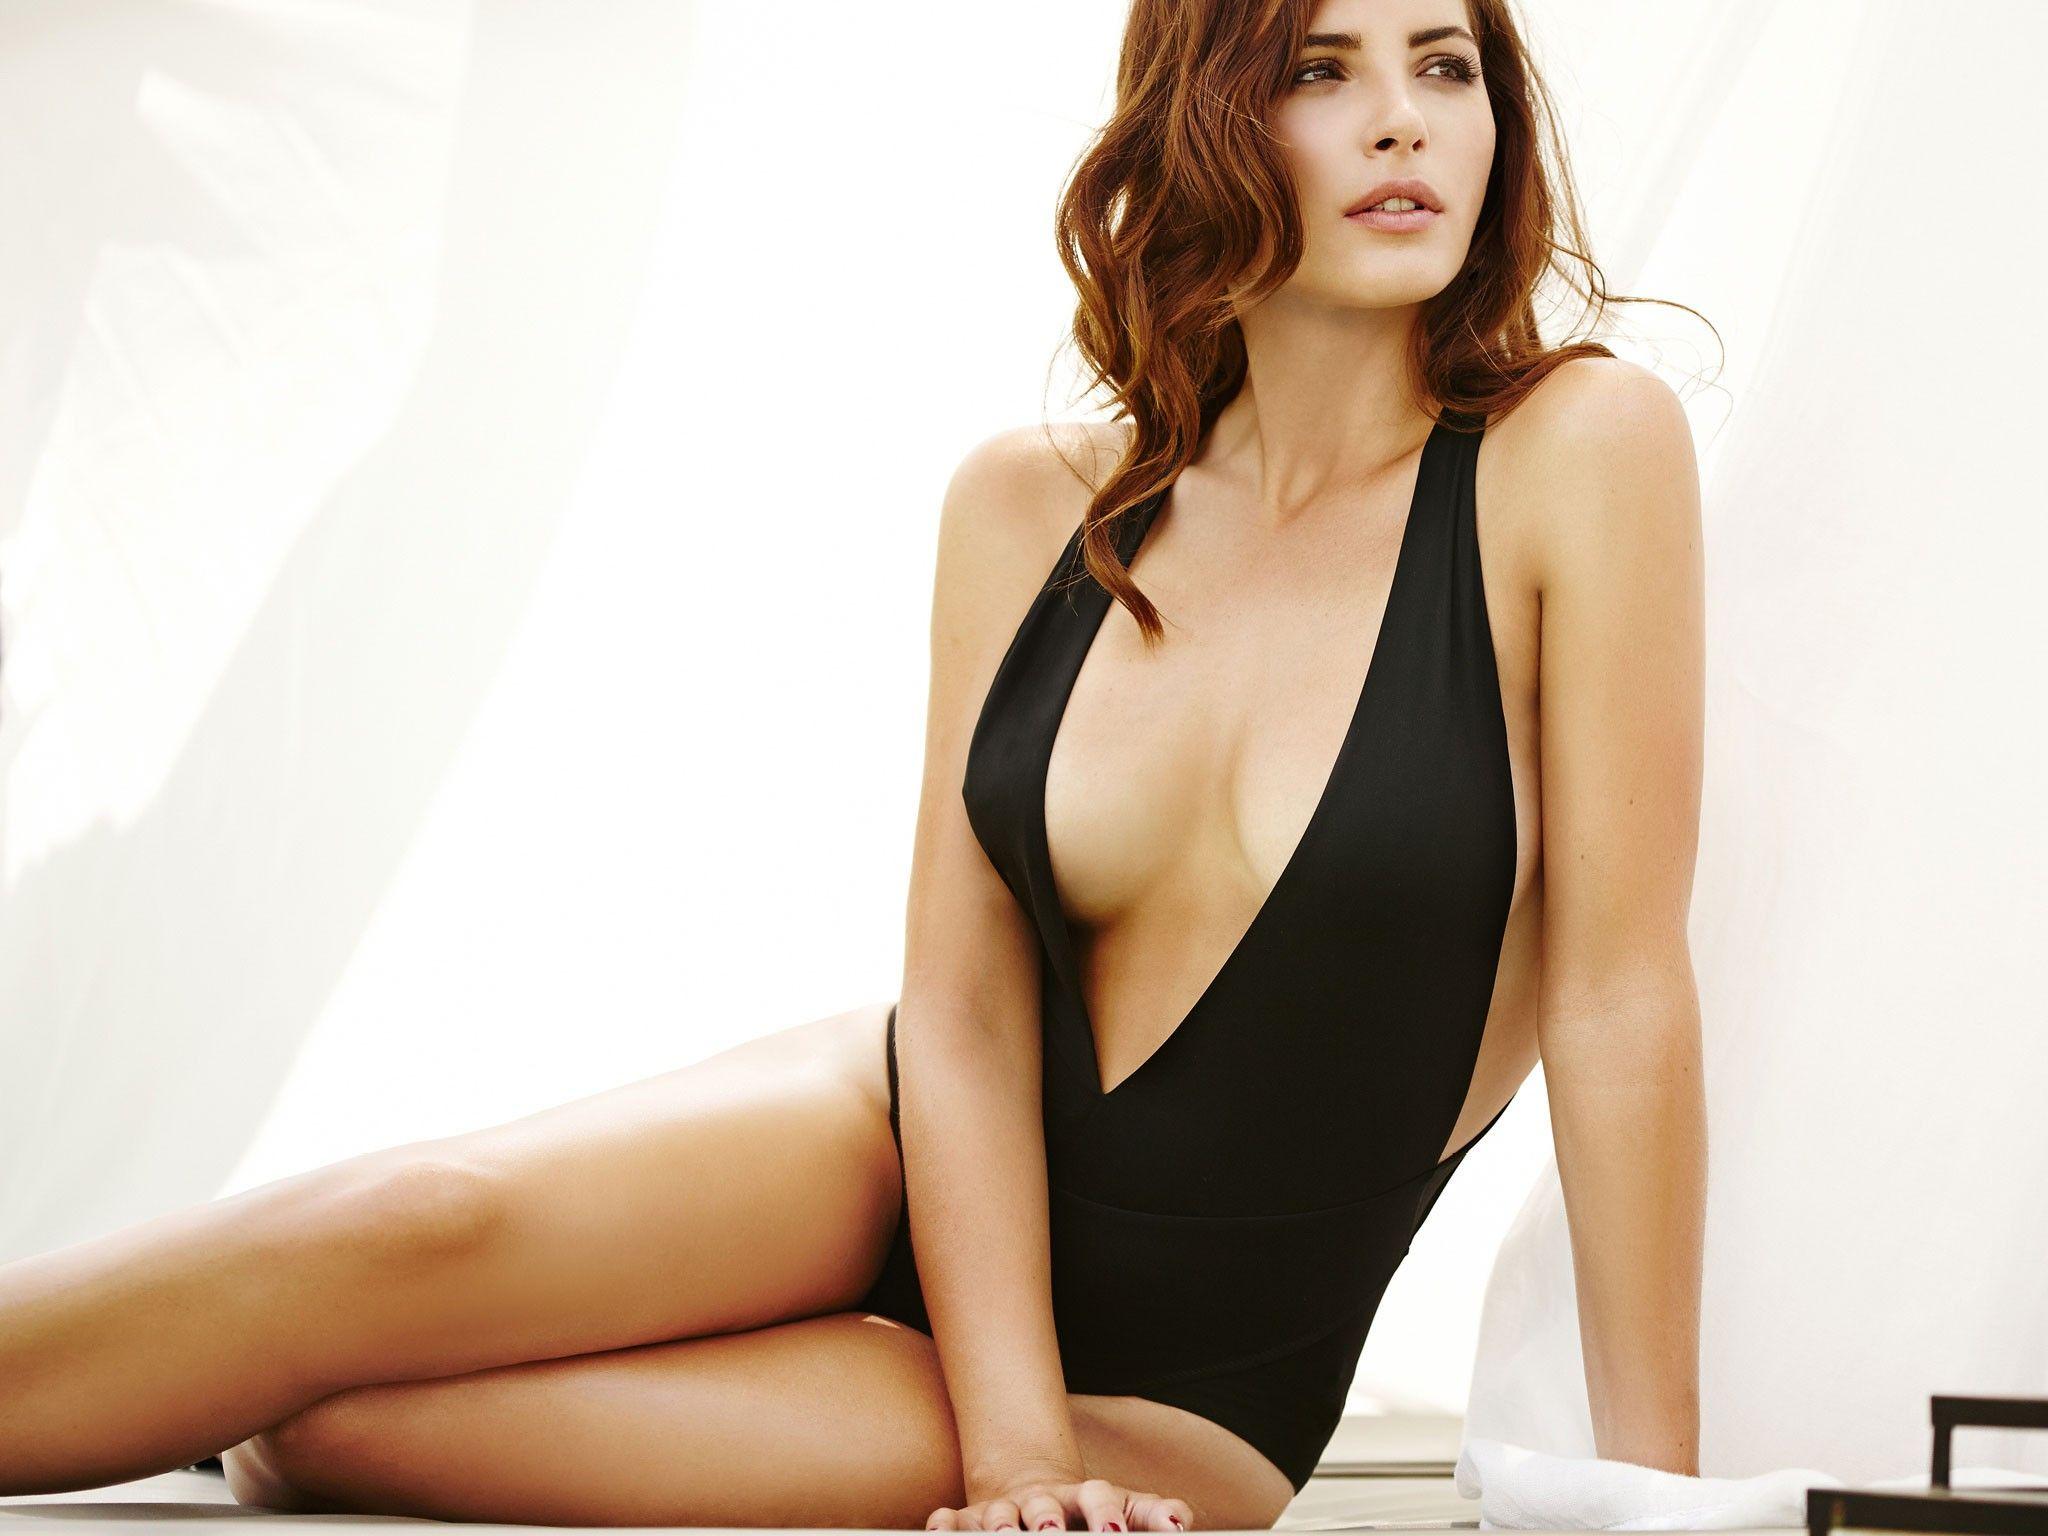 Fashion models naked fakes